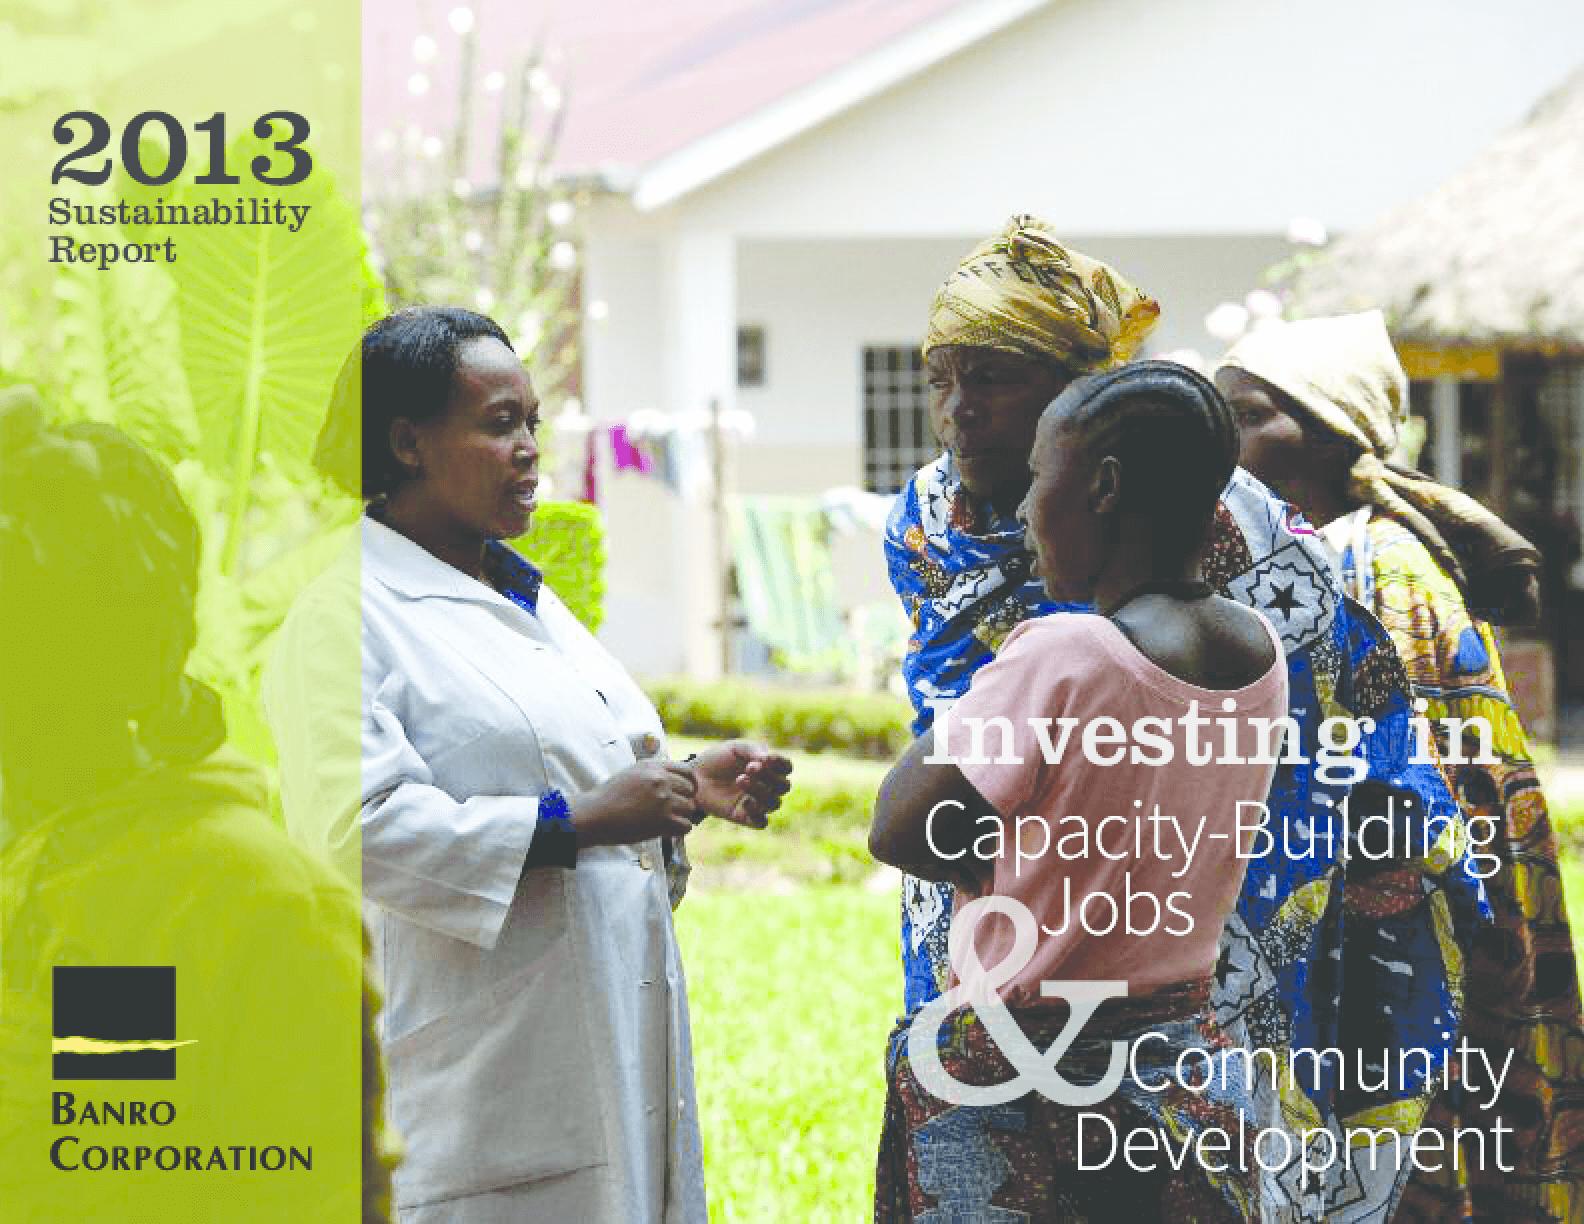 Banro Corporation 2013 CSR Report: Partners in Community Development